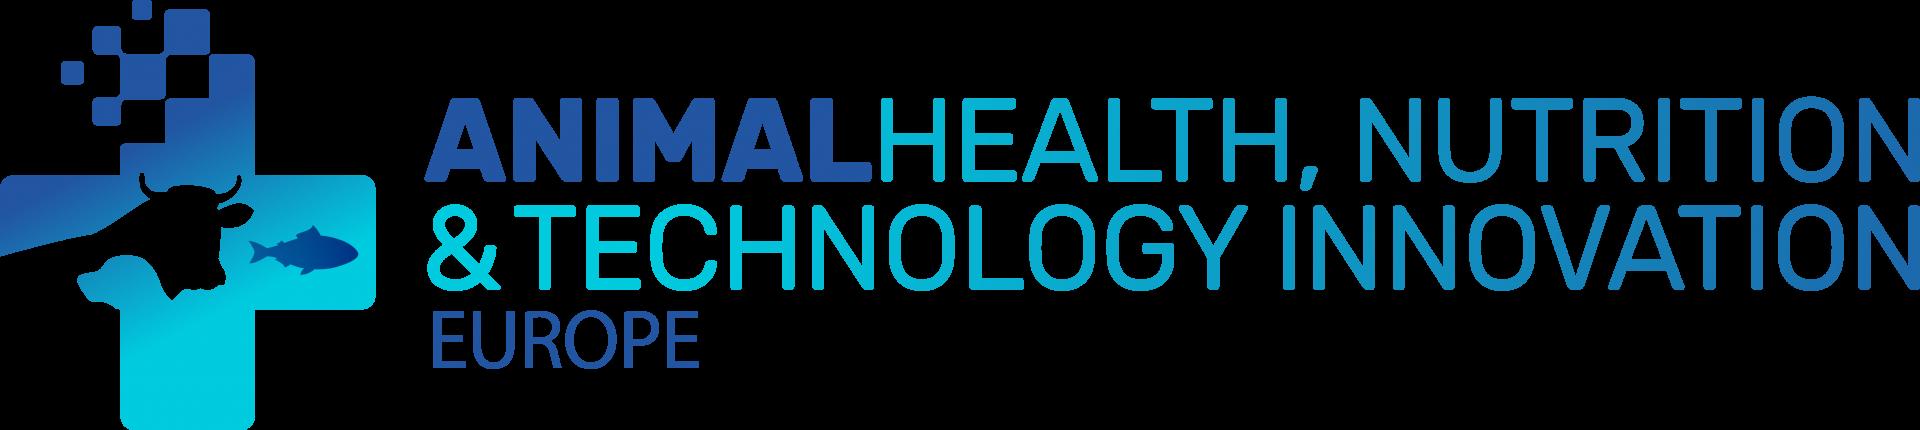 Animal Health Innovation Europe 2022